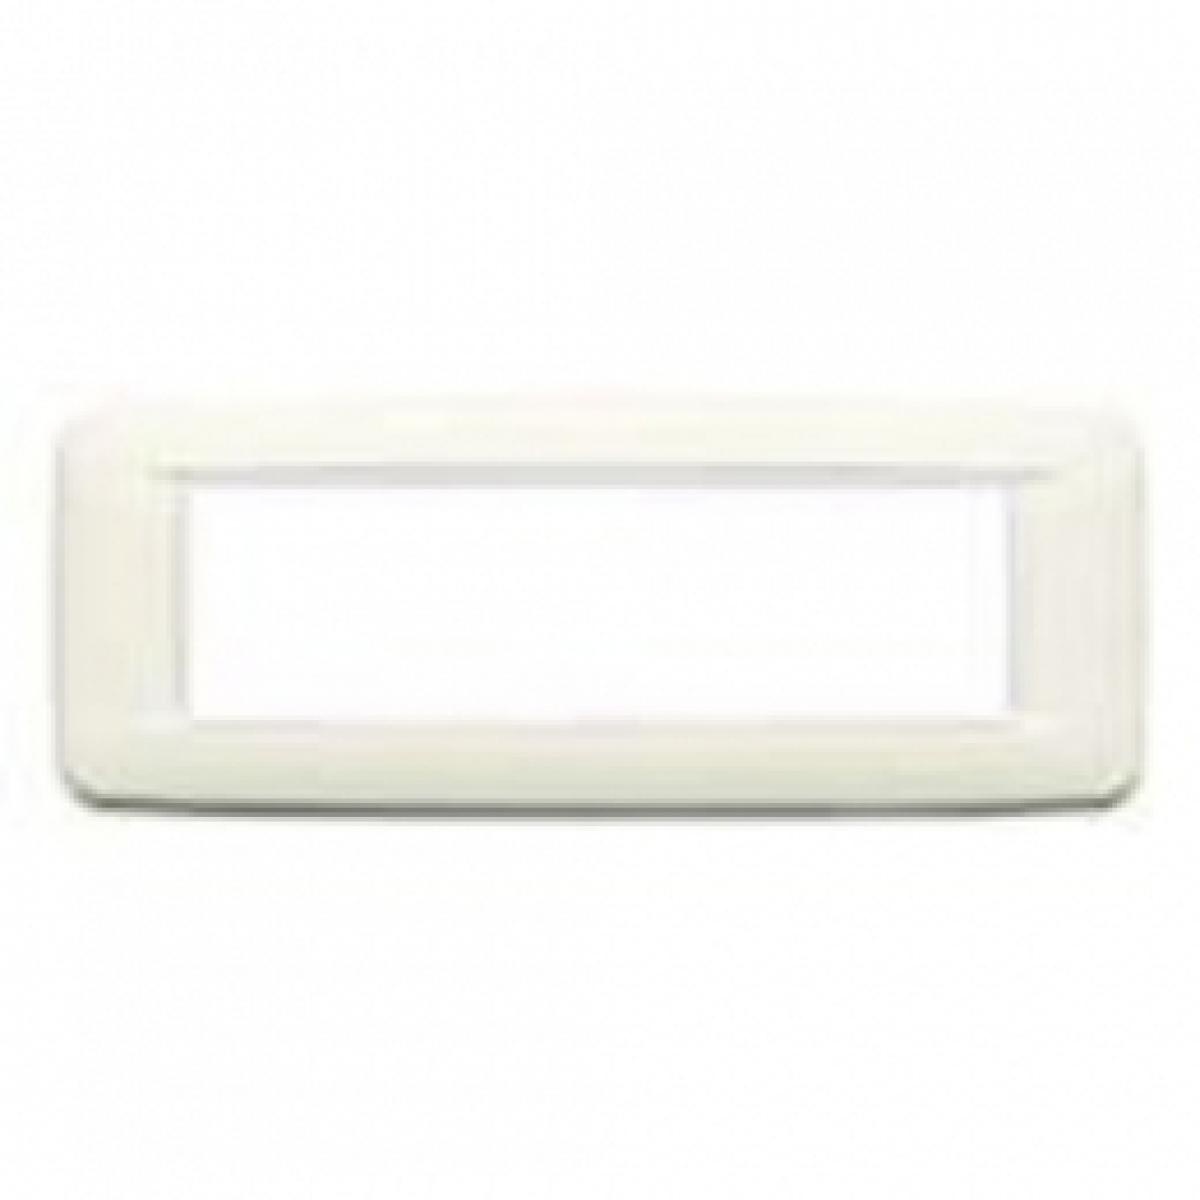 Eikon  vimar  placca round 7  posti colore bianco artico 20687.B01